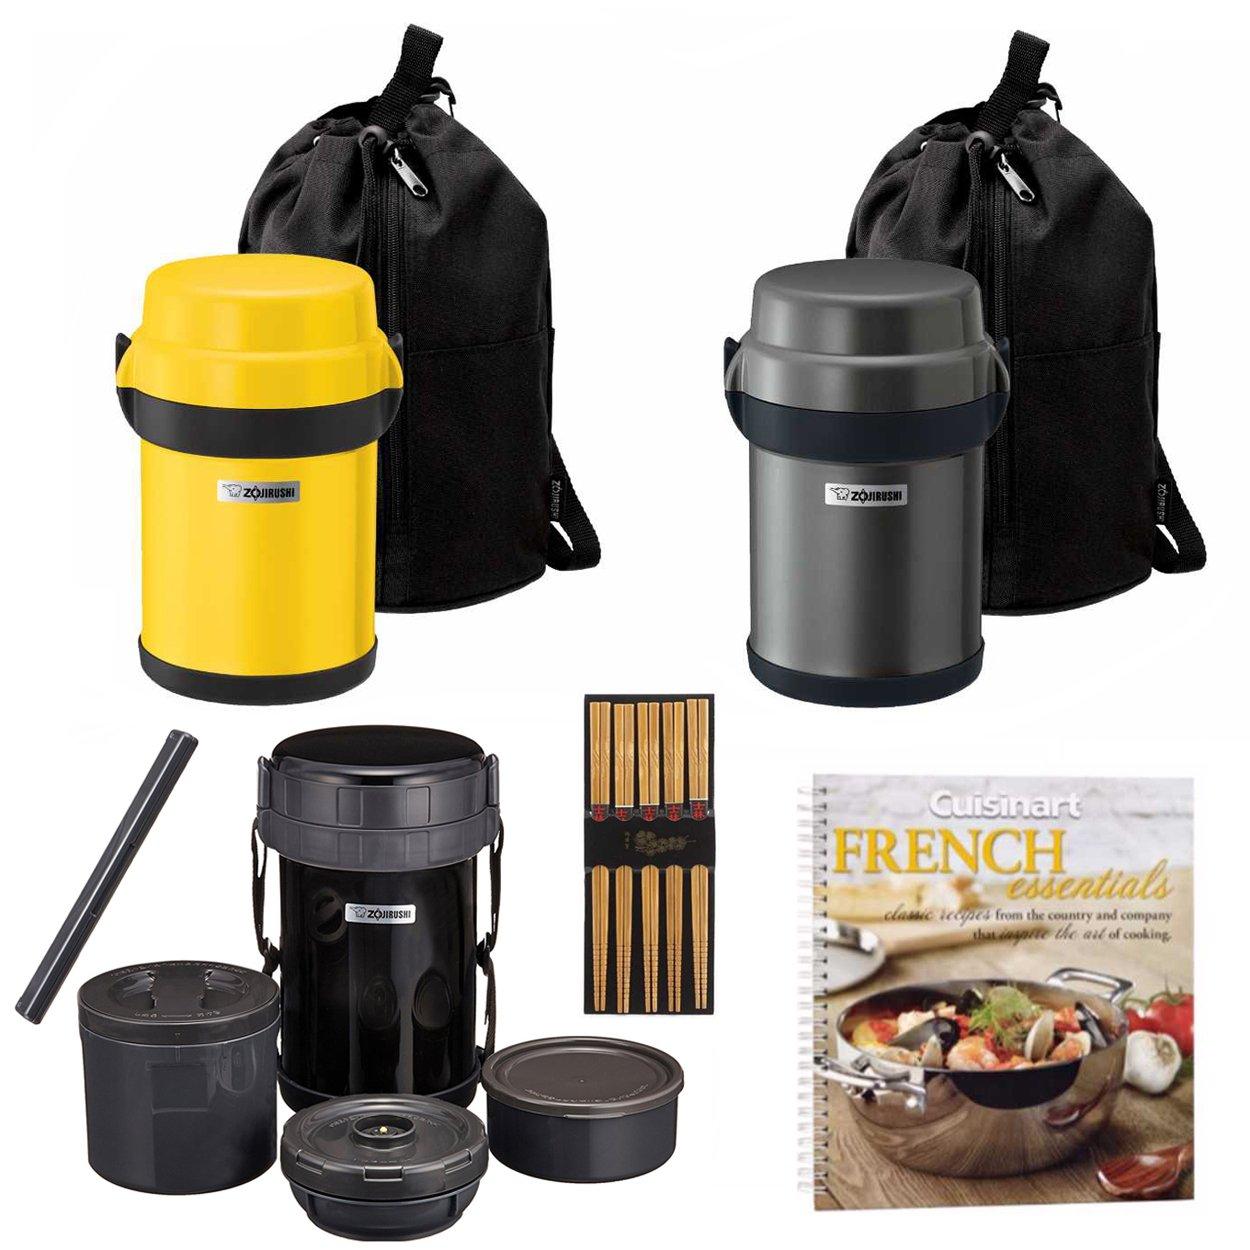 Zojirushi Classic Stainless Lunch Jar 3 Pack. Black, Gun Metal and Yellow + Free Cookbook and Chopsticks.